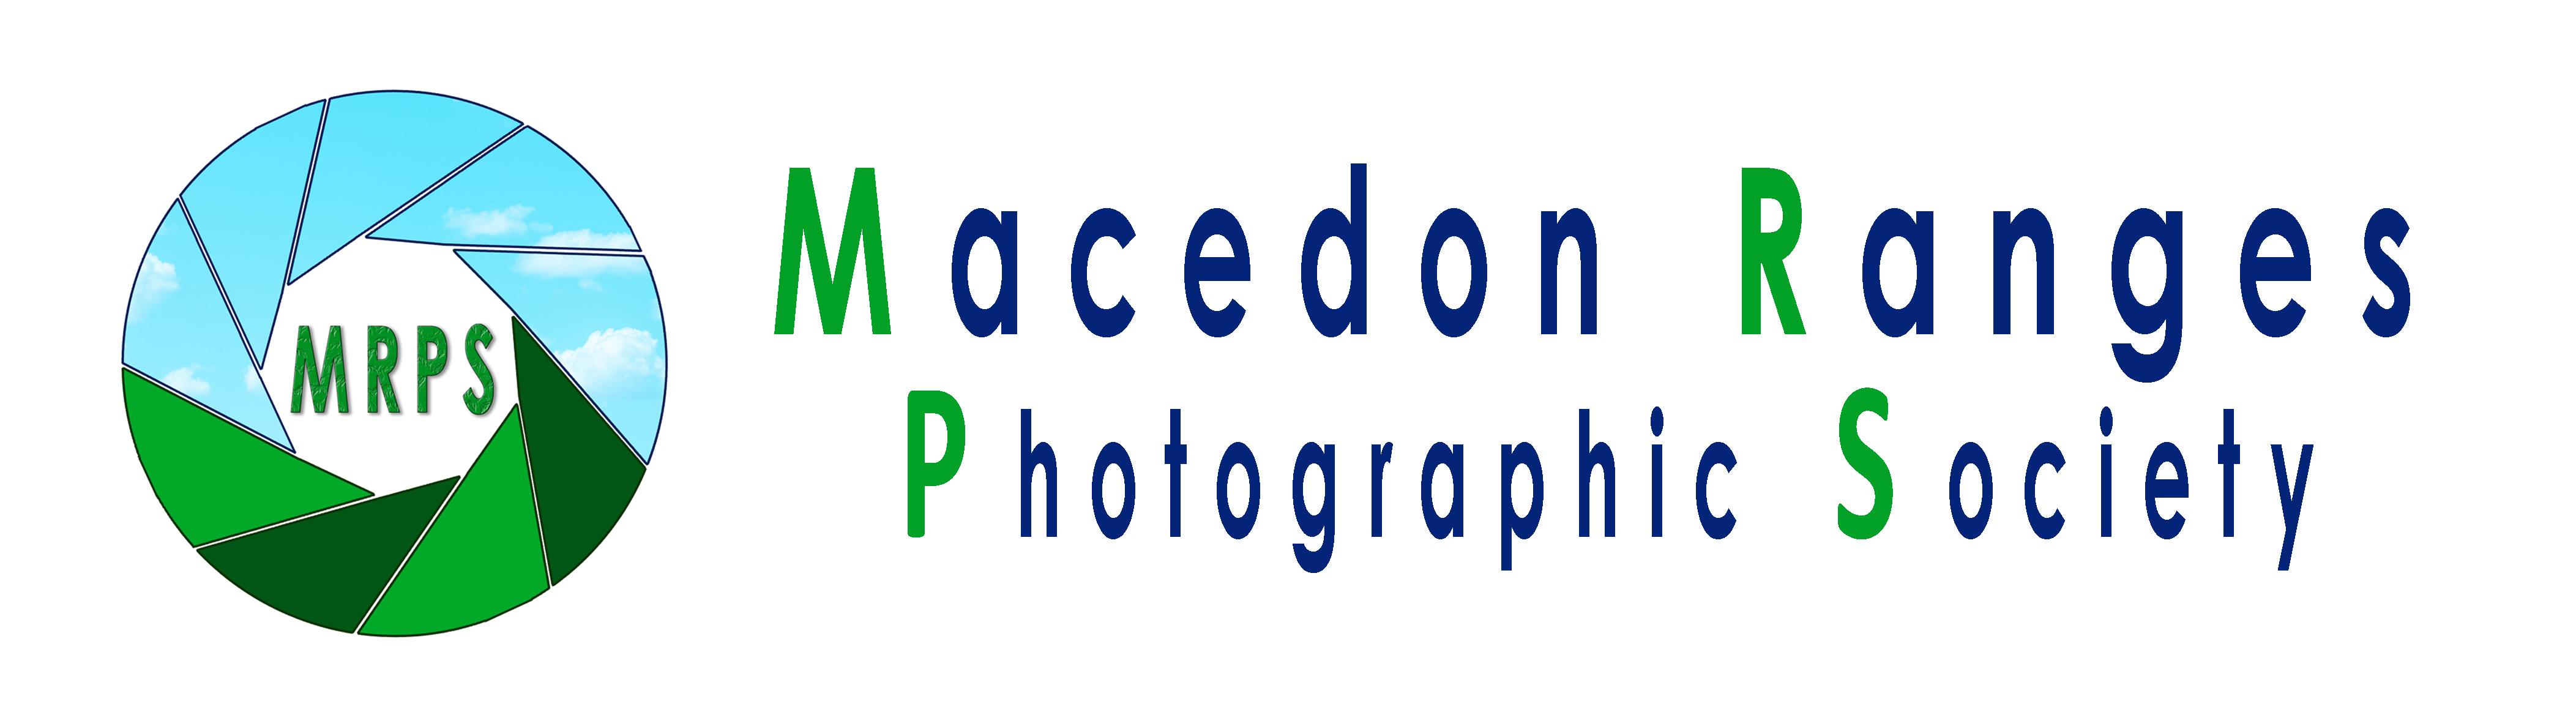 Macedon Ranges Photographic Society